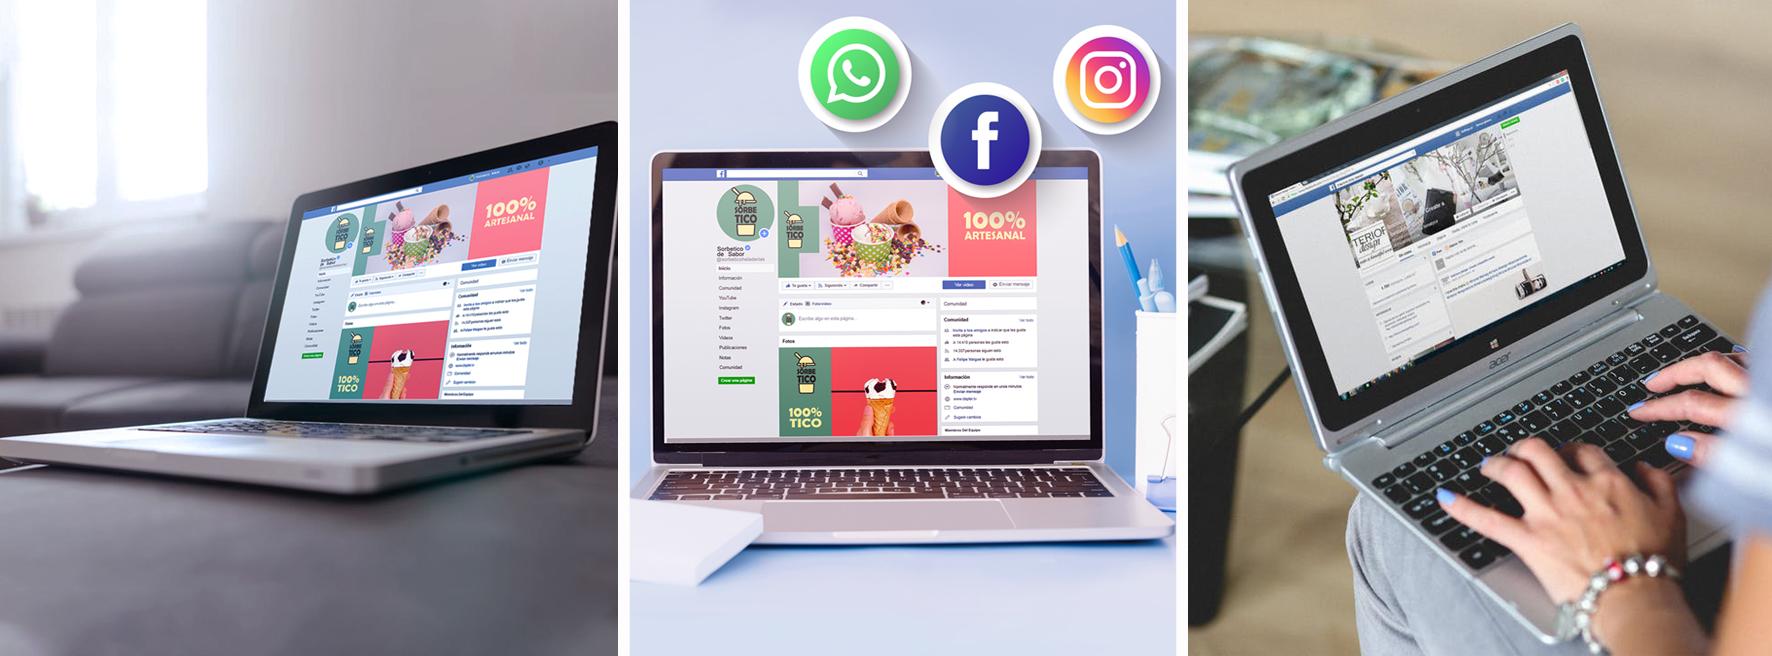 Banner Marketing Digital general Santa Gráfica online